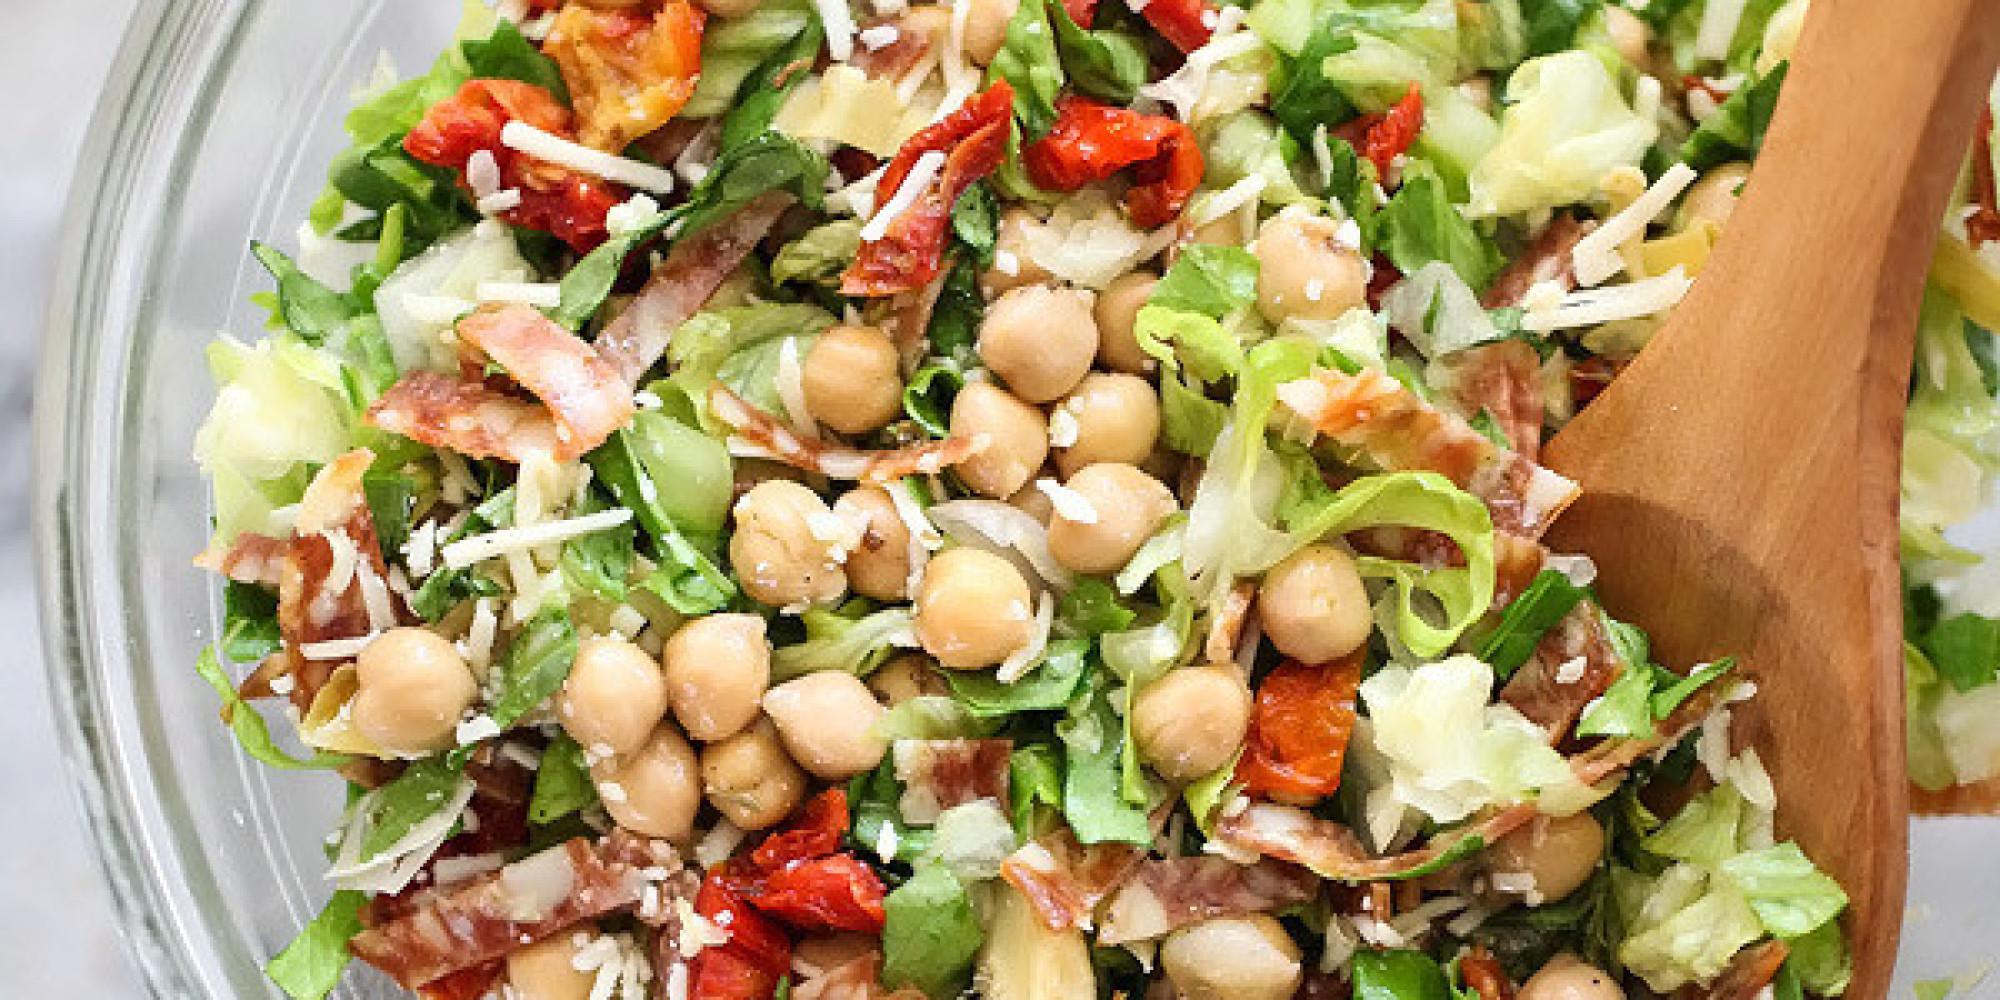 Healthy Salads Recipes  Salad Recipes That Make Eating Healthy A Breeze